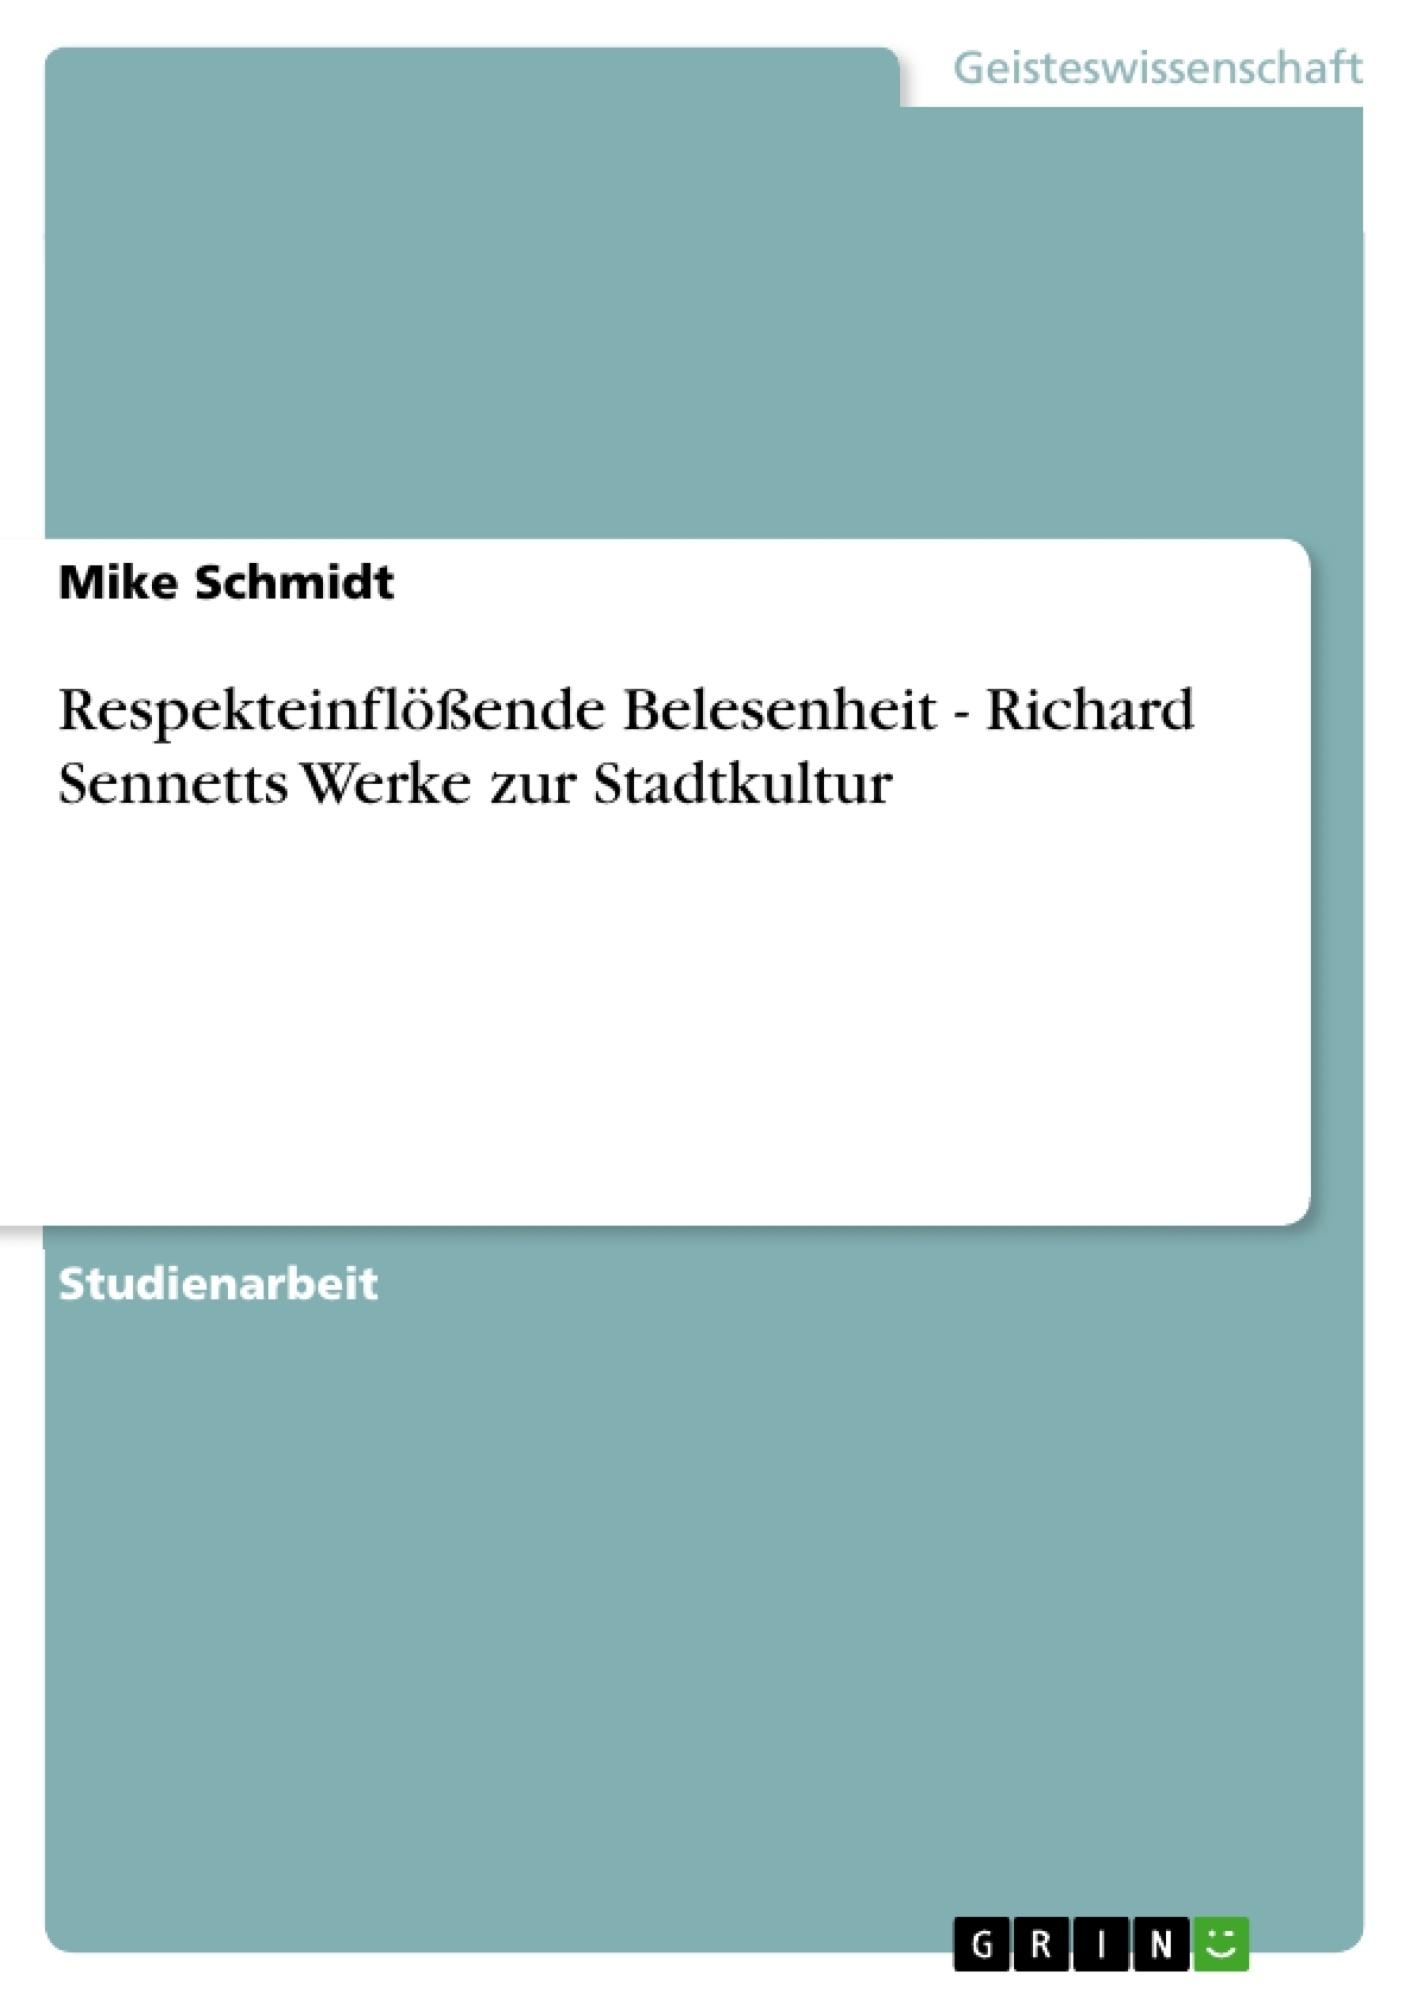 Titel: Respekteinflößende Belesenheit - Richard Sennetts Werke zur Stadtkultur